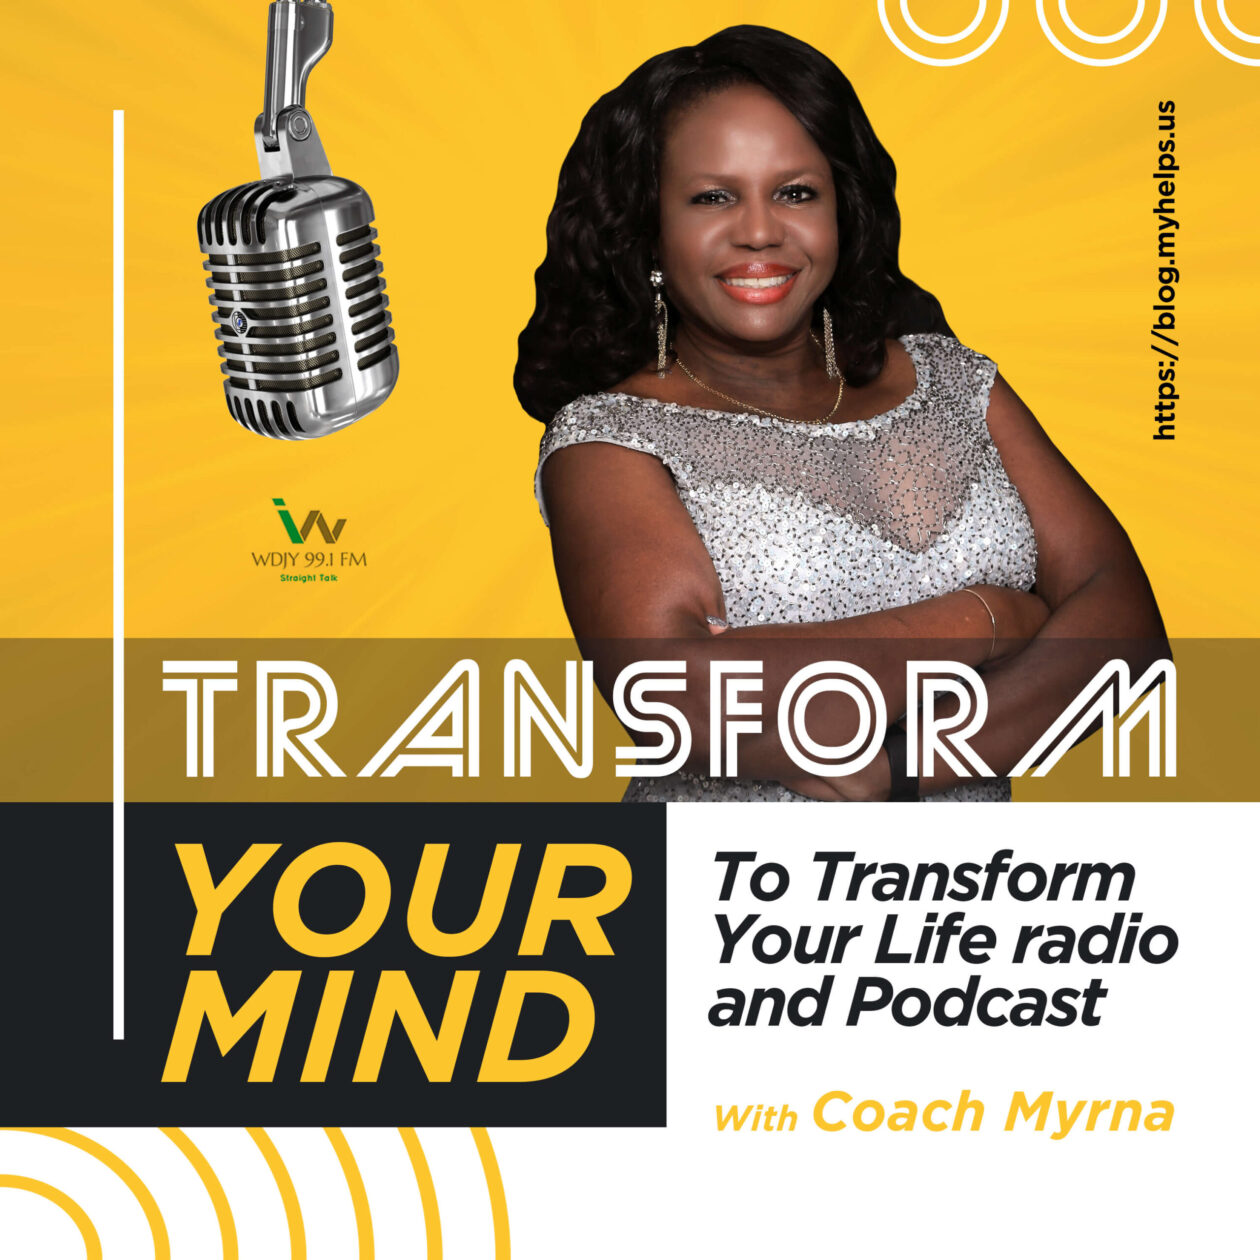 Myrna Young Life Coach